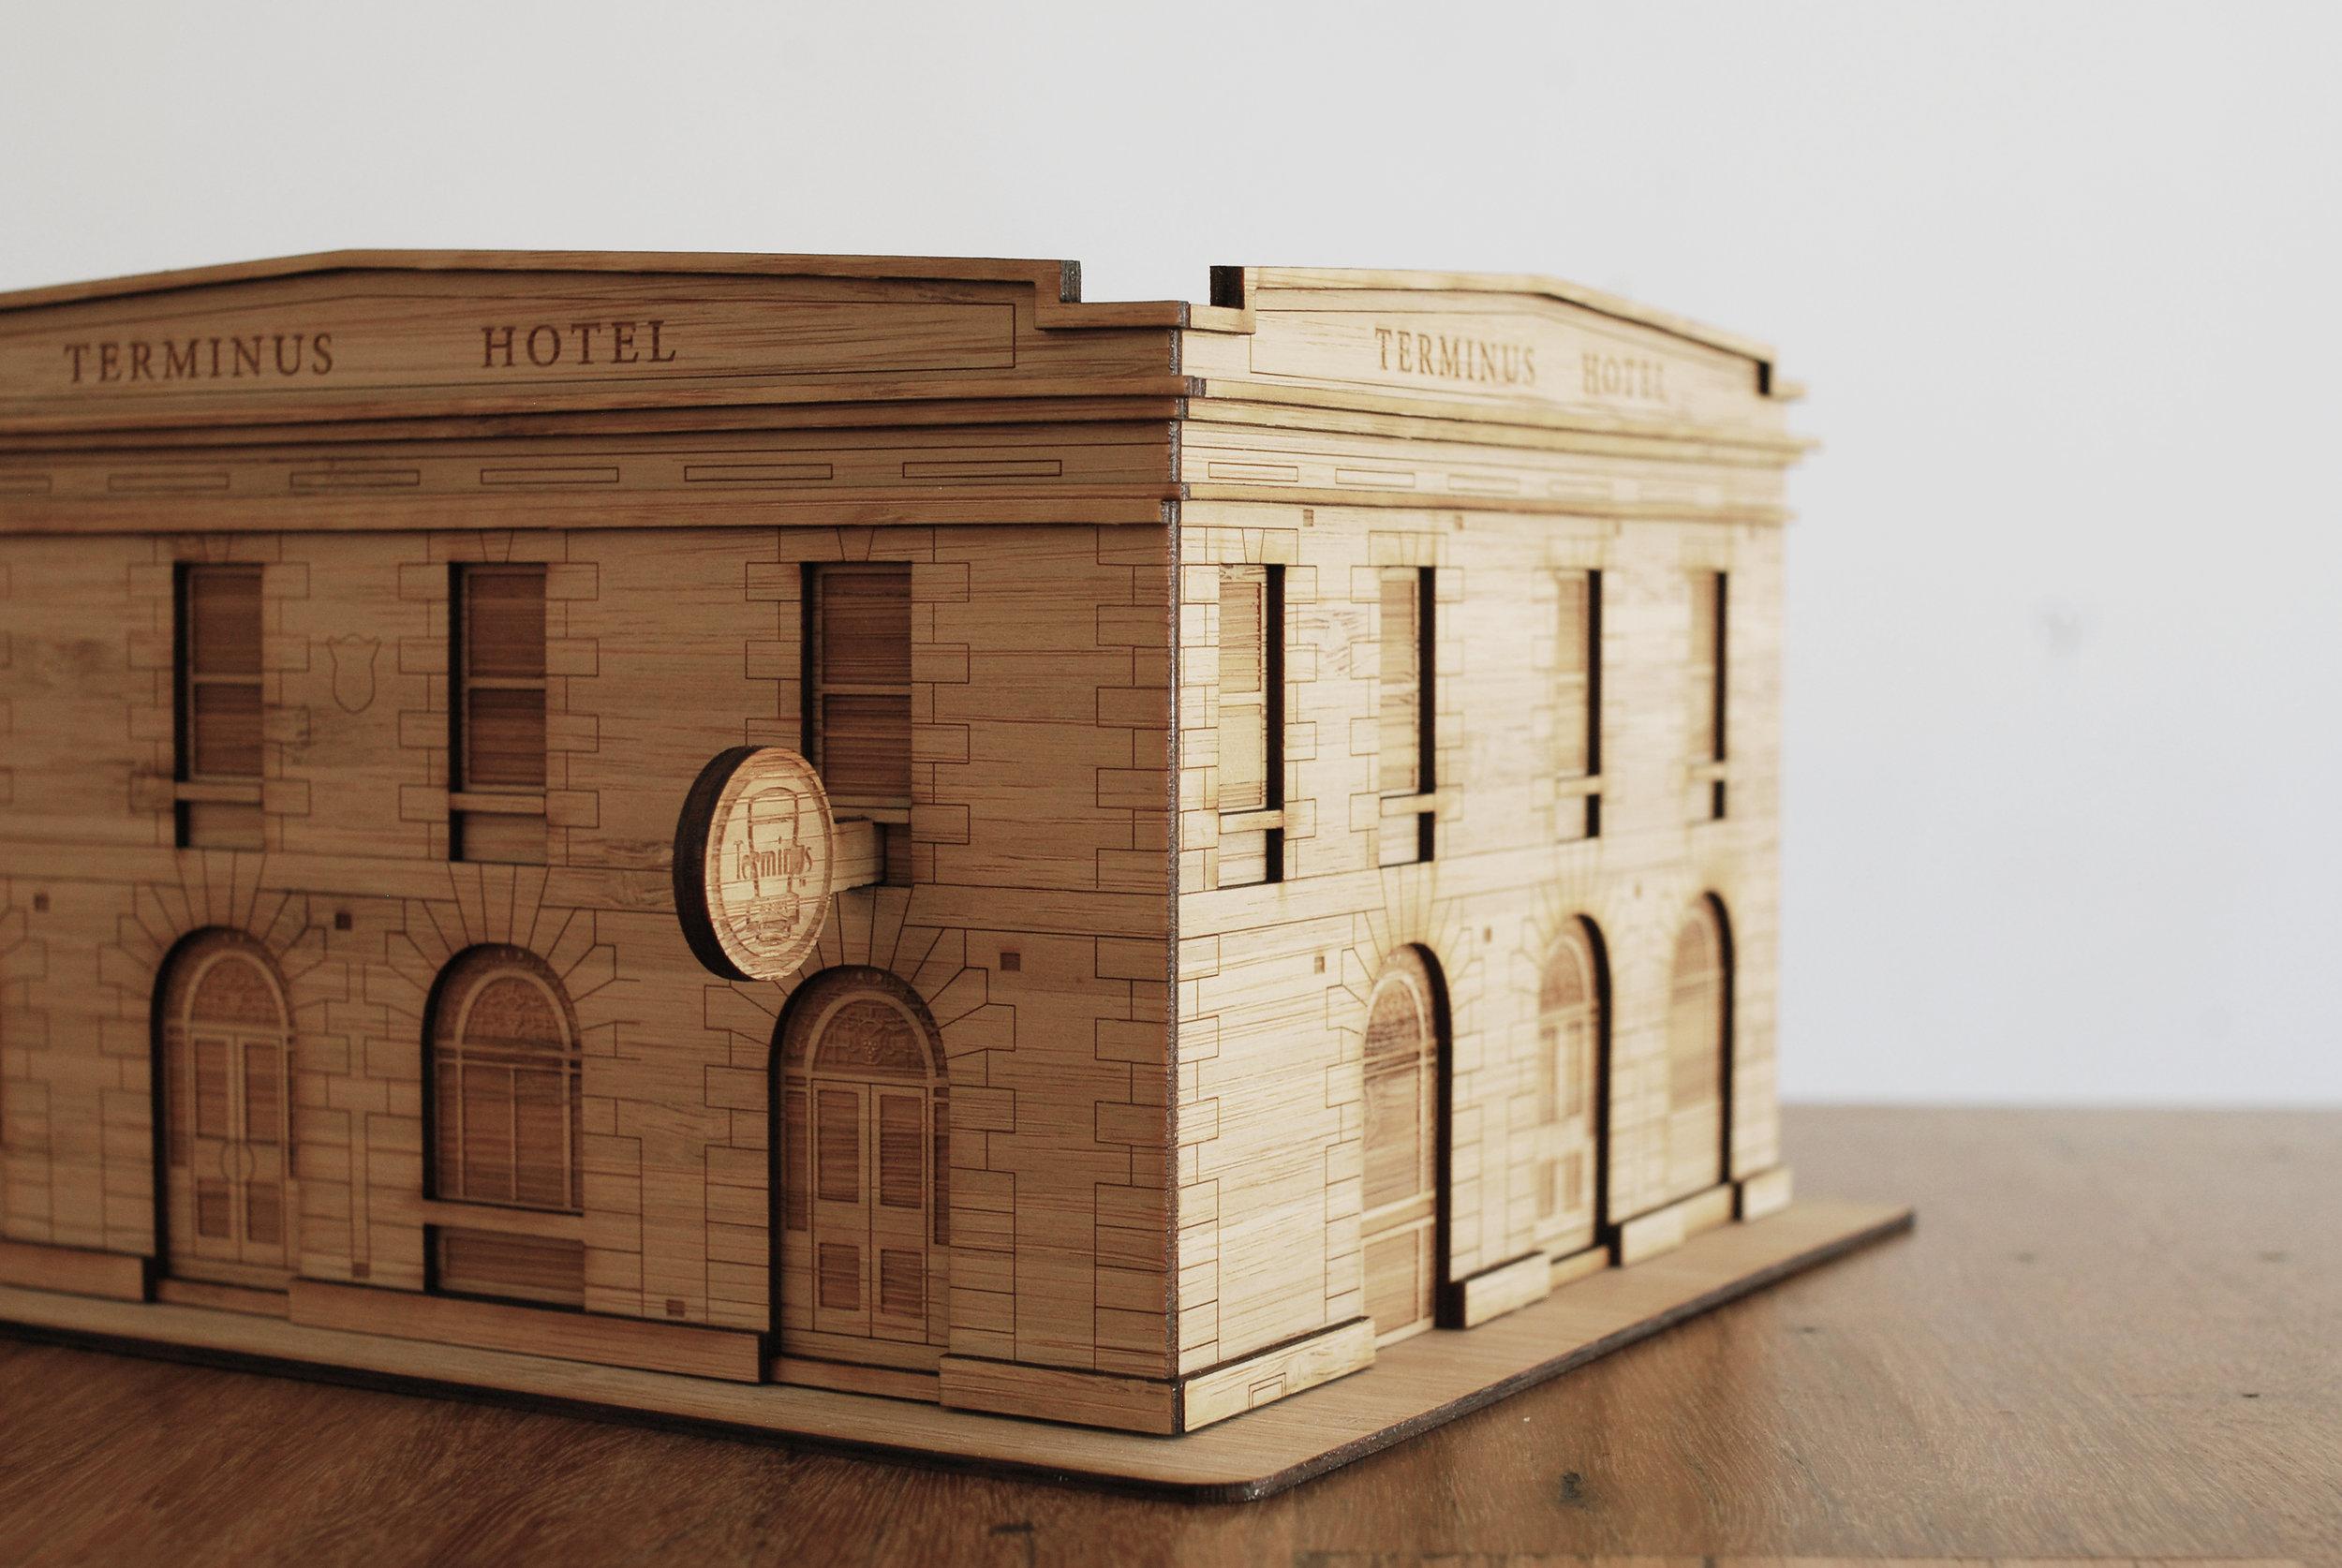 Terminus Hotel - Fitzroy North